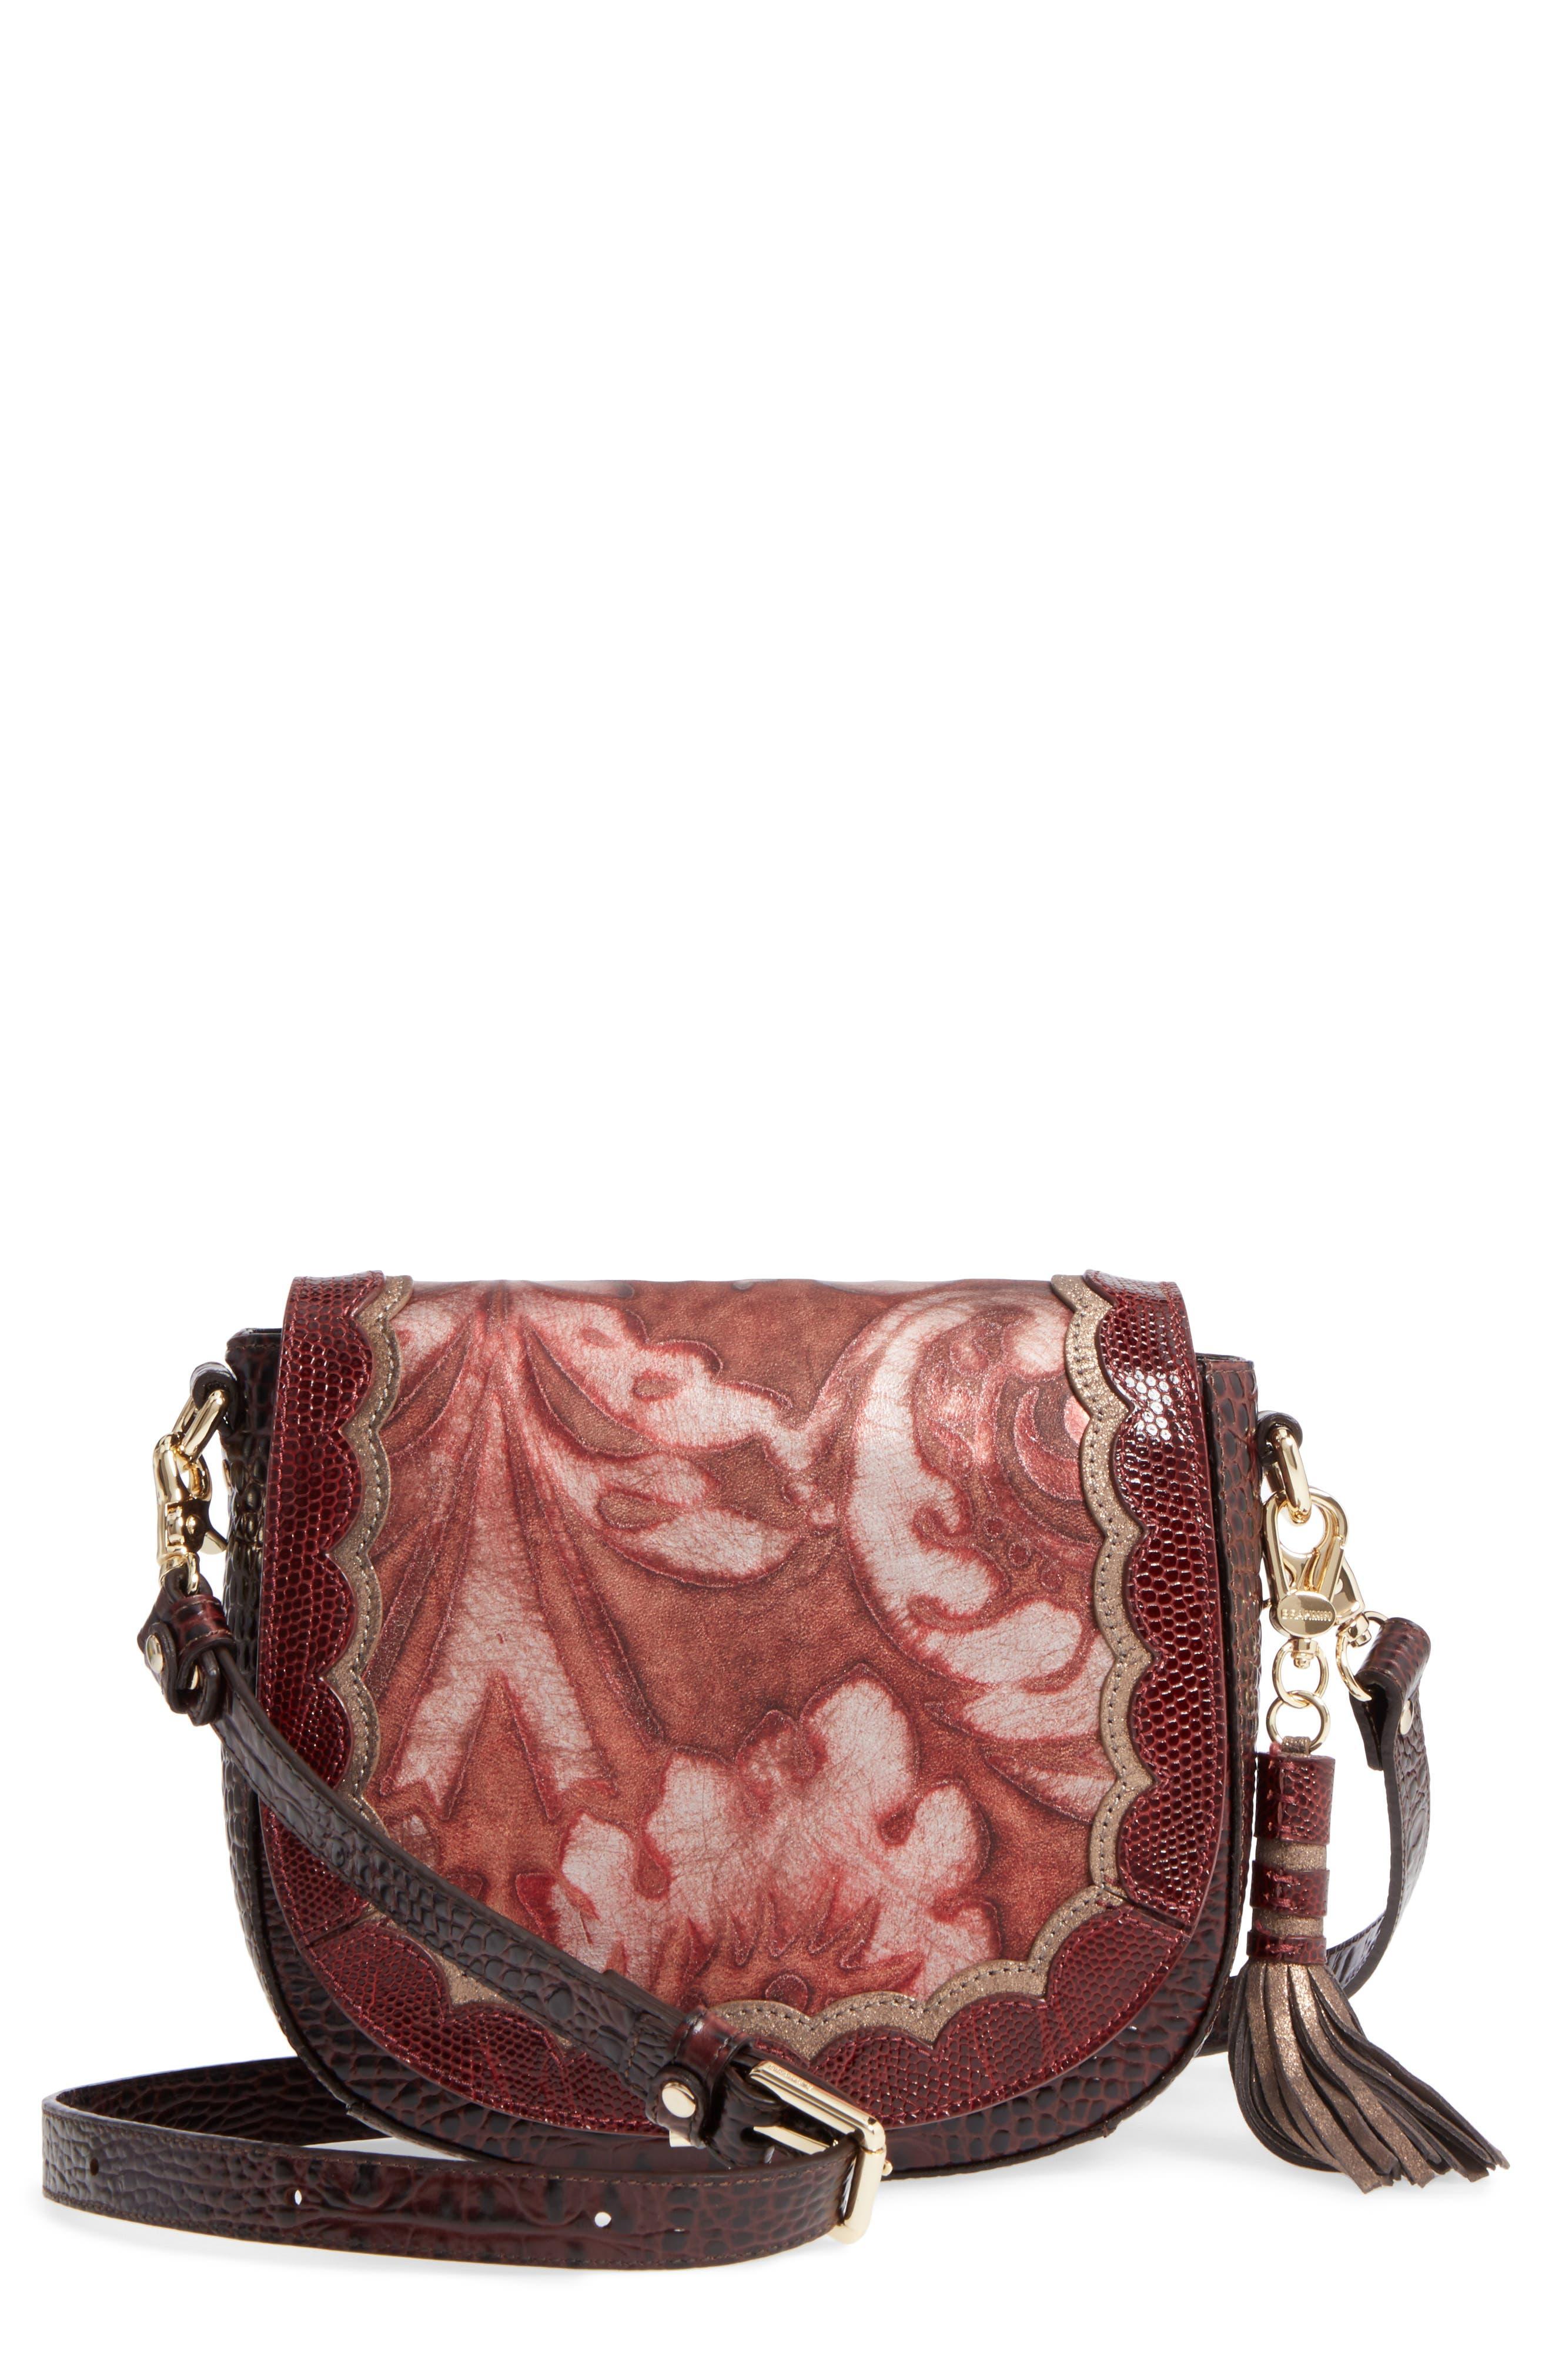 Verona Mini Sonny Leather Crossbody Bag,                             Main thumbnail 1, color,                             Red